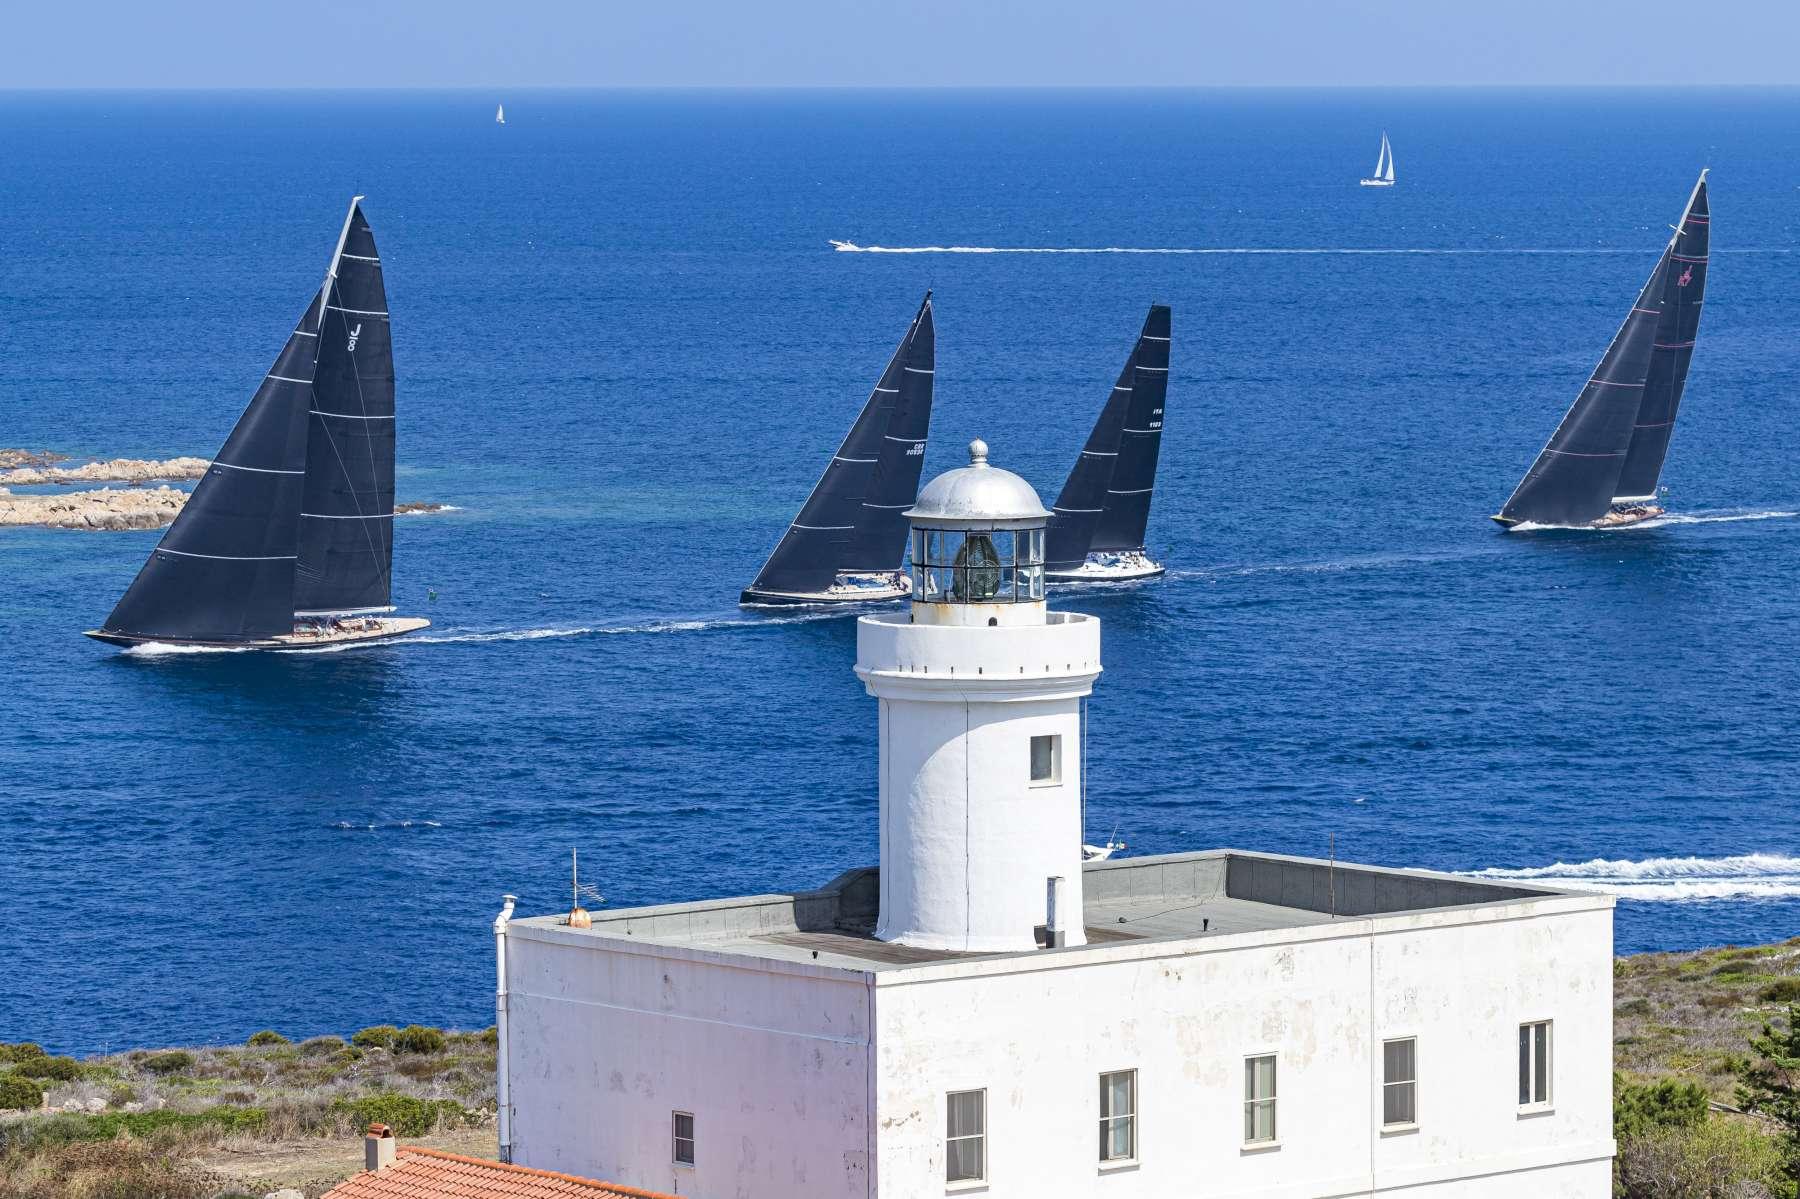 Annullate la Maxi Yacht Rolex Cup e la Rolex Swan Cup  - NEWS - Yacht Club Costa Smeralda